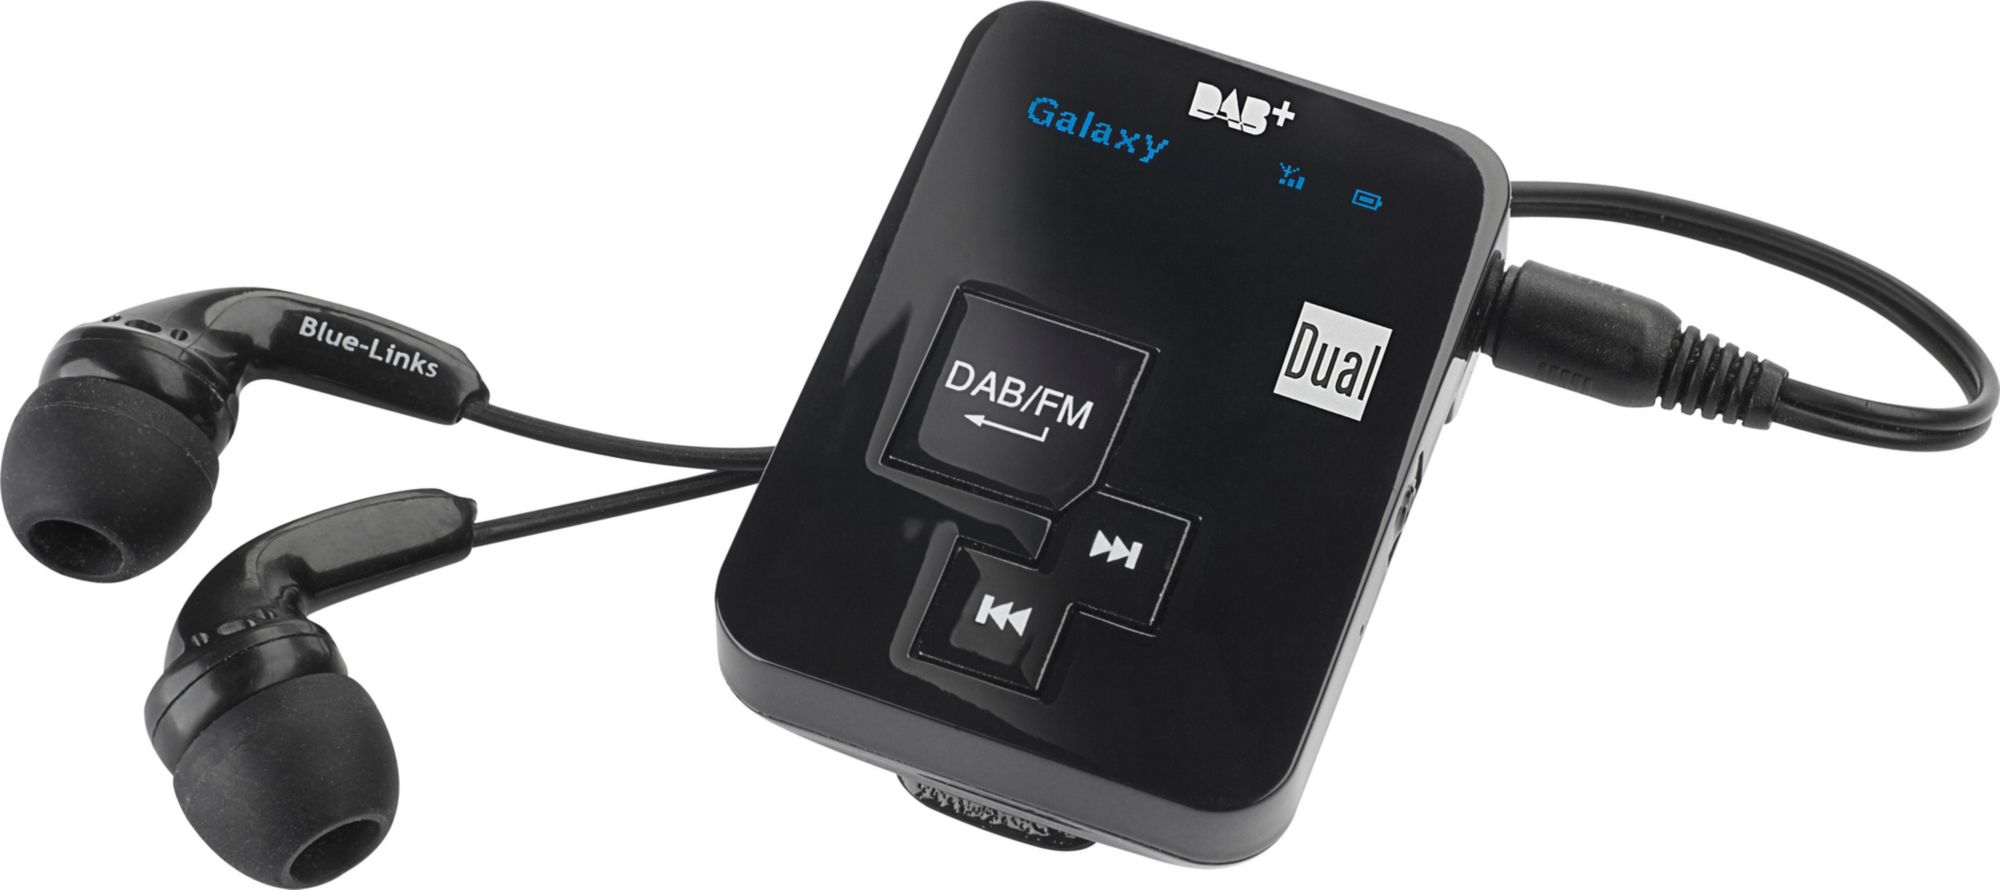 DUAL Dual DAB Pocket Radio 2 Portables Digitalradio mit Akku Radio